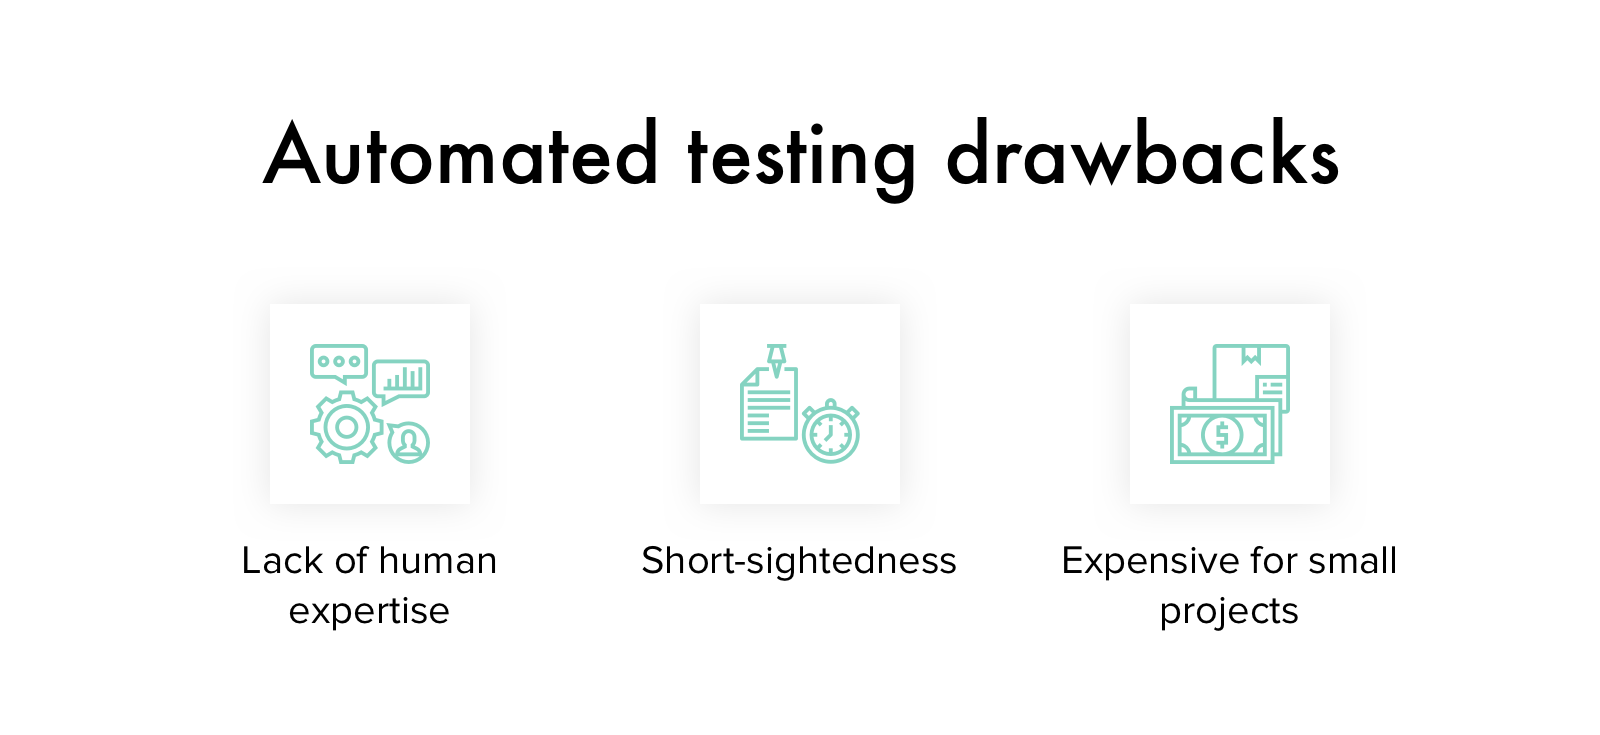 Automated testing drawbacks